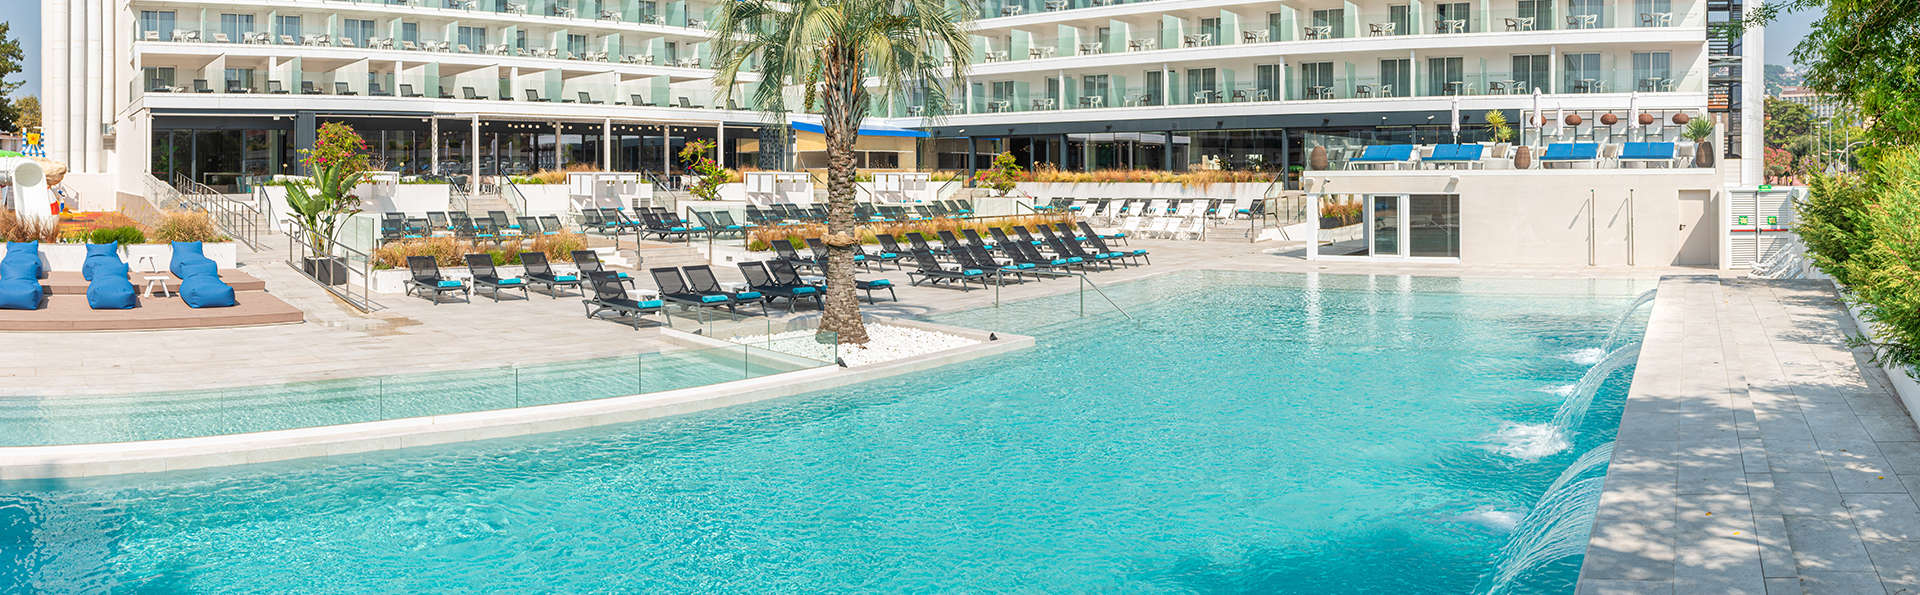 Hotel l'Azure - EDIT_FRONT_Y_PISCINA_DAY.jpg